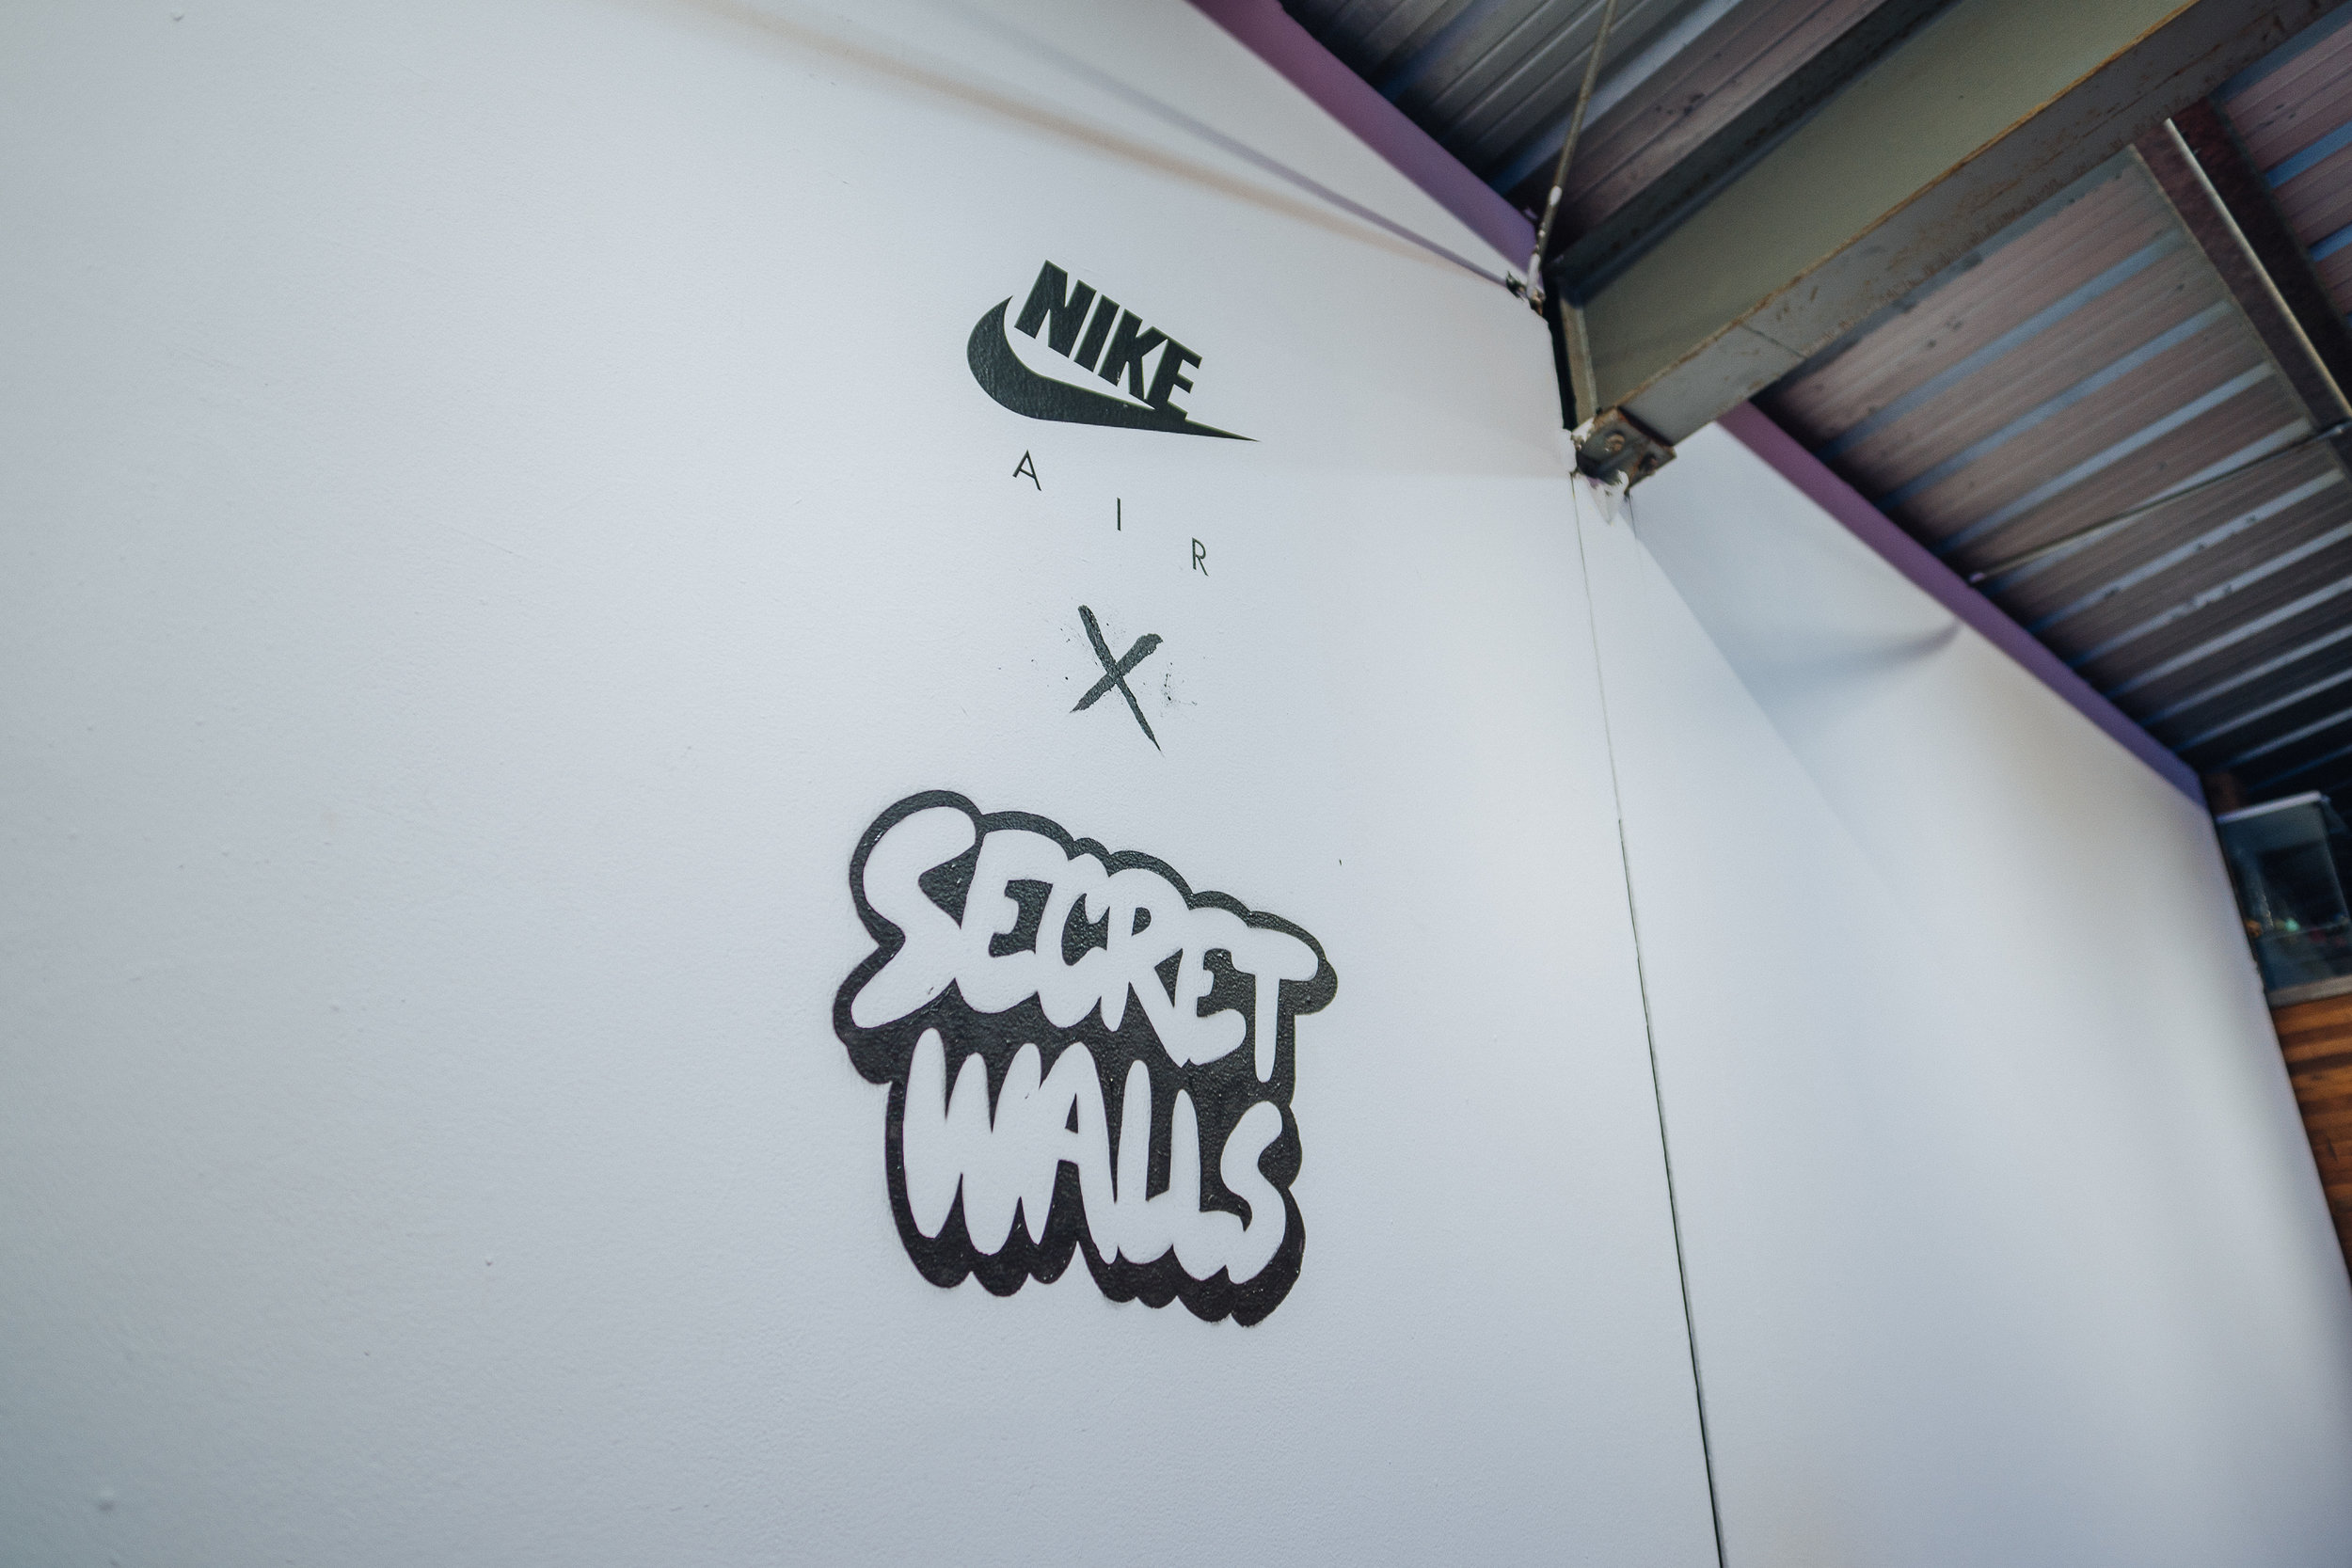 Nike x Secret Walls